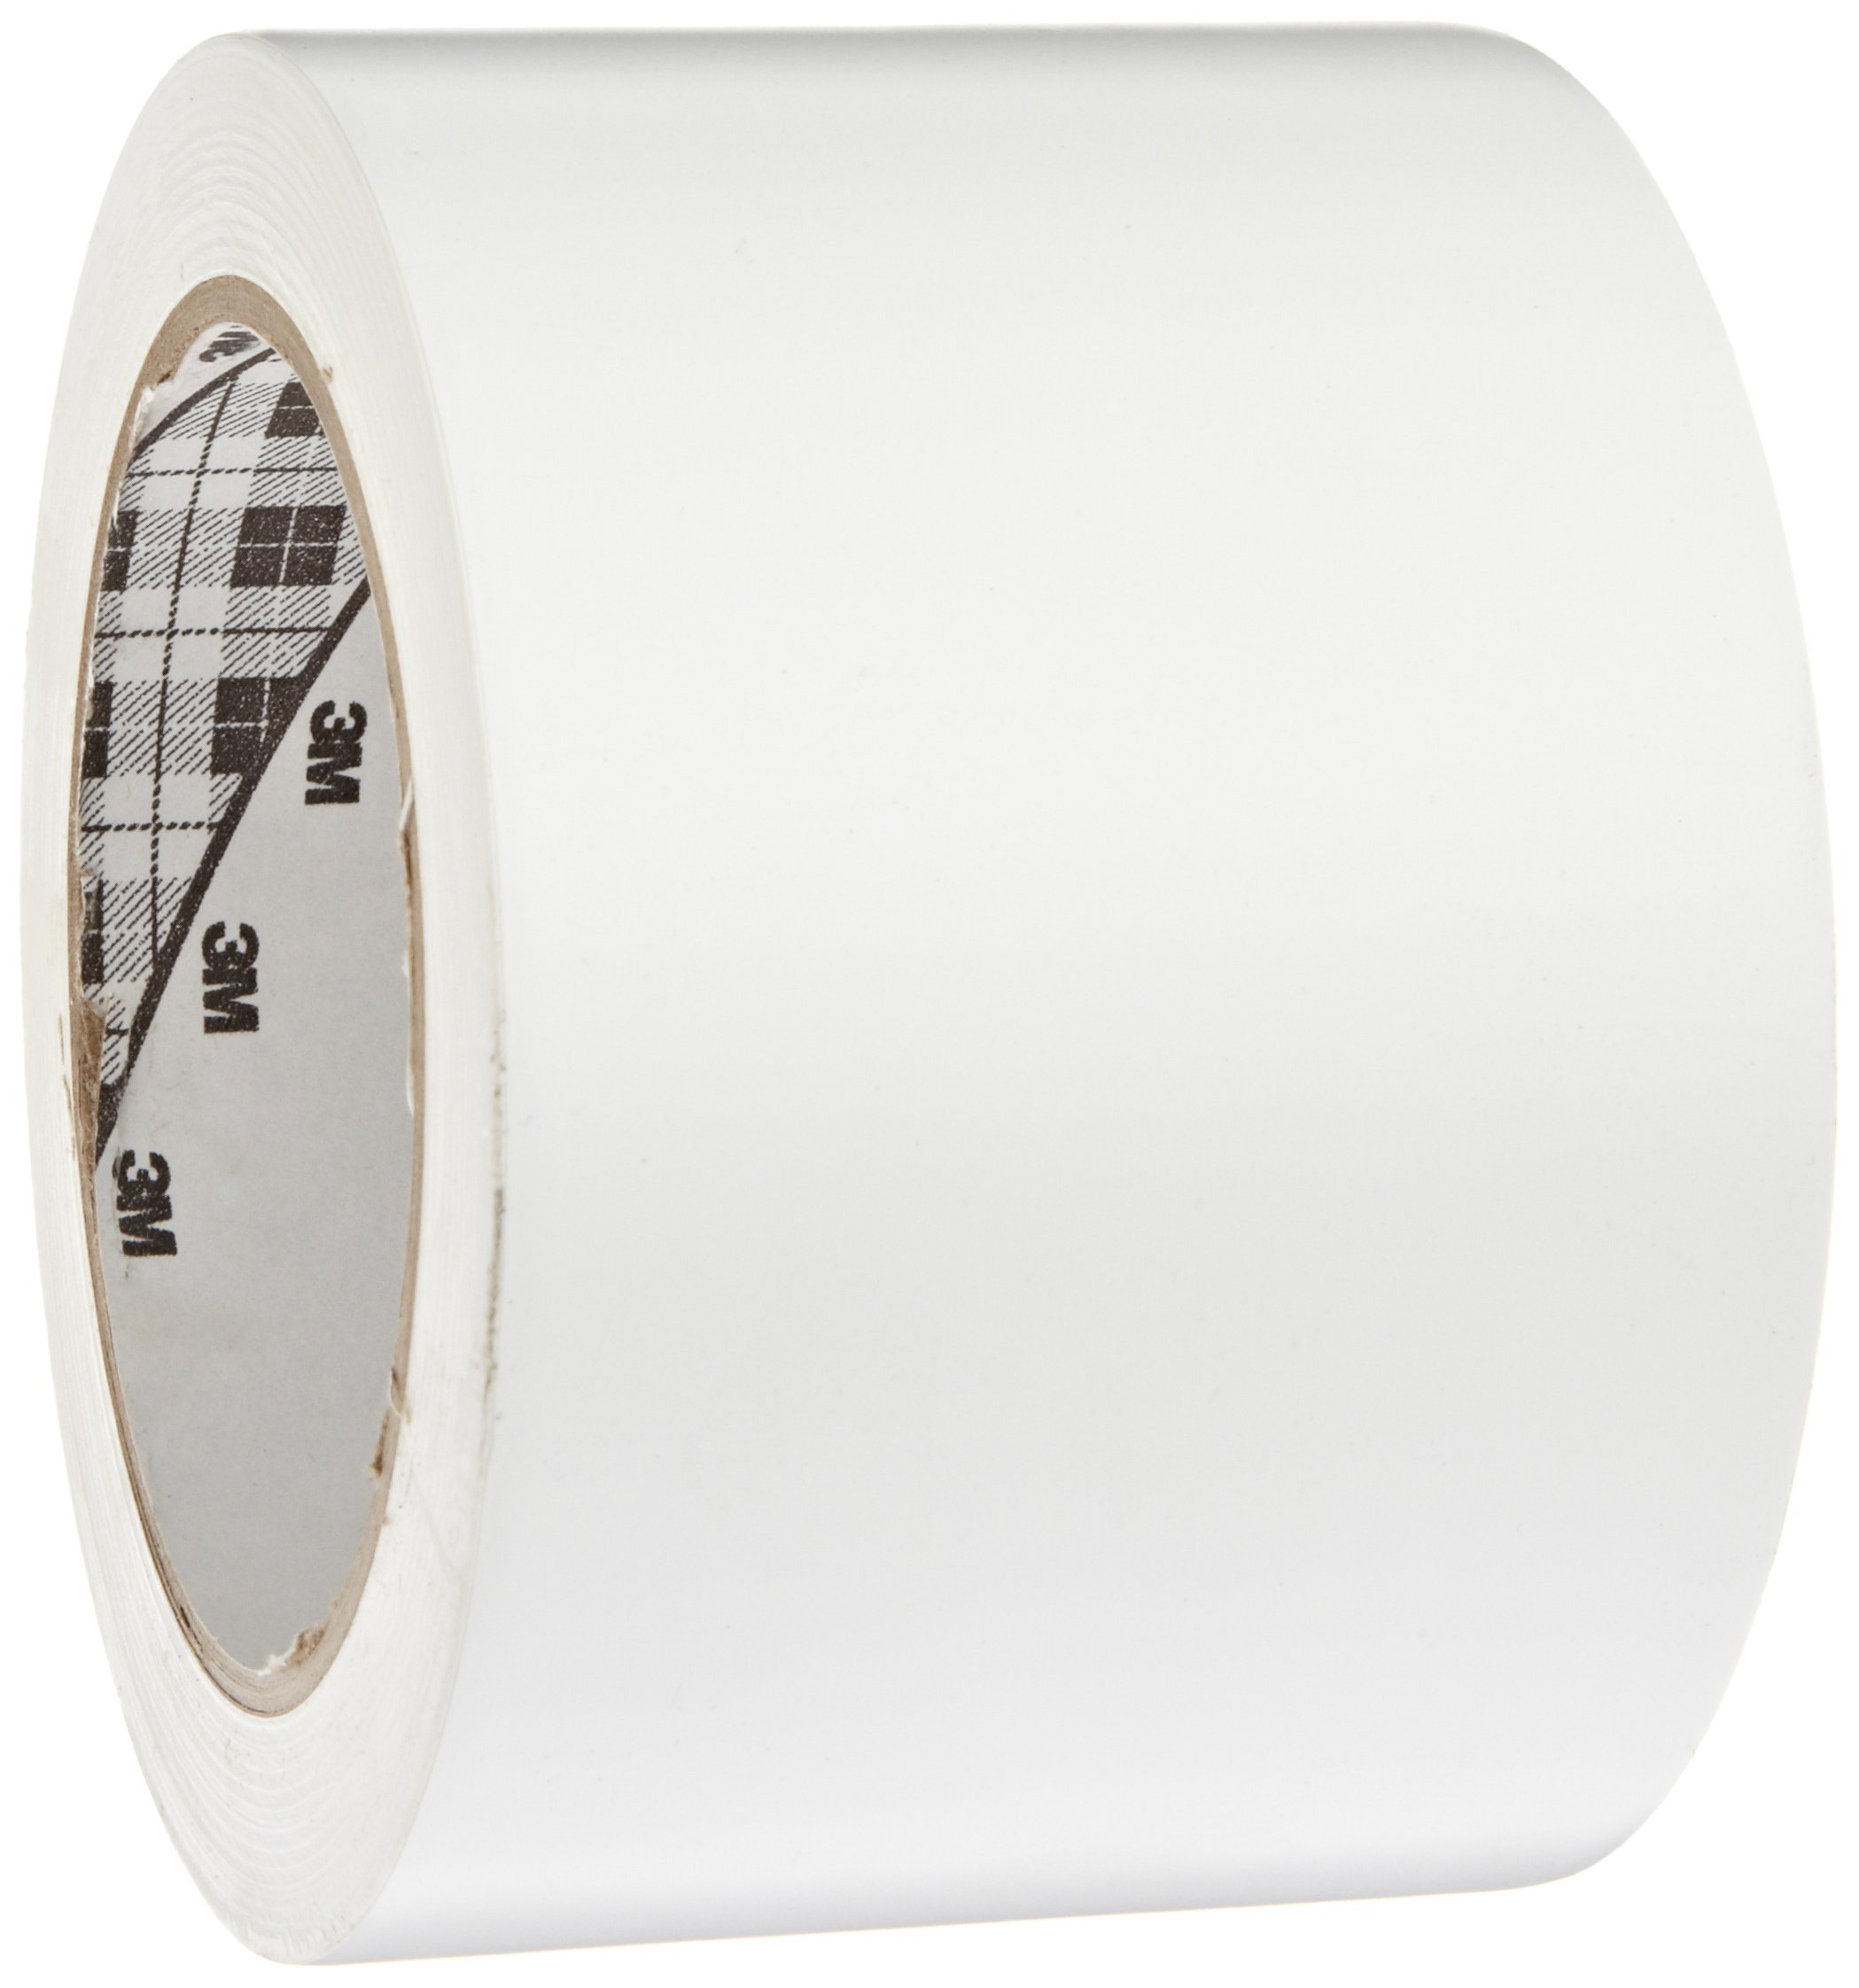 3M General Purpose Vinyl Tape 764 White, 3 in x 36 yd 5.0 mil (Pack of 1)